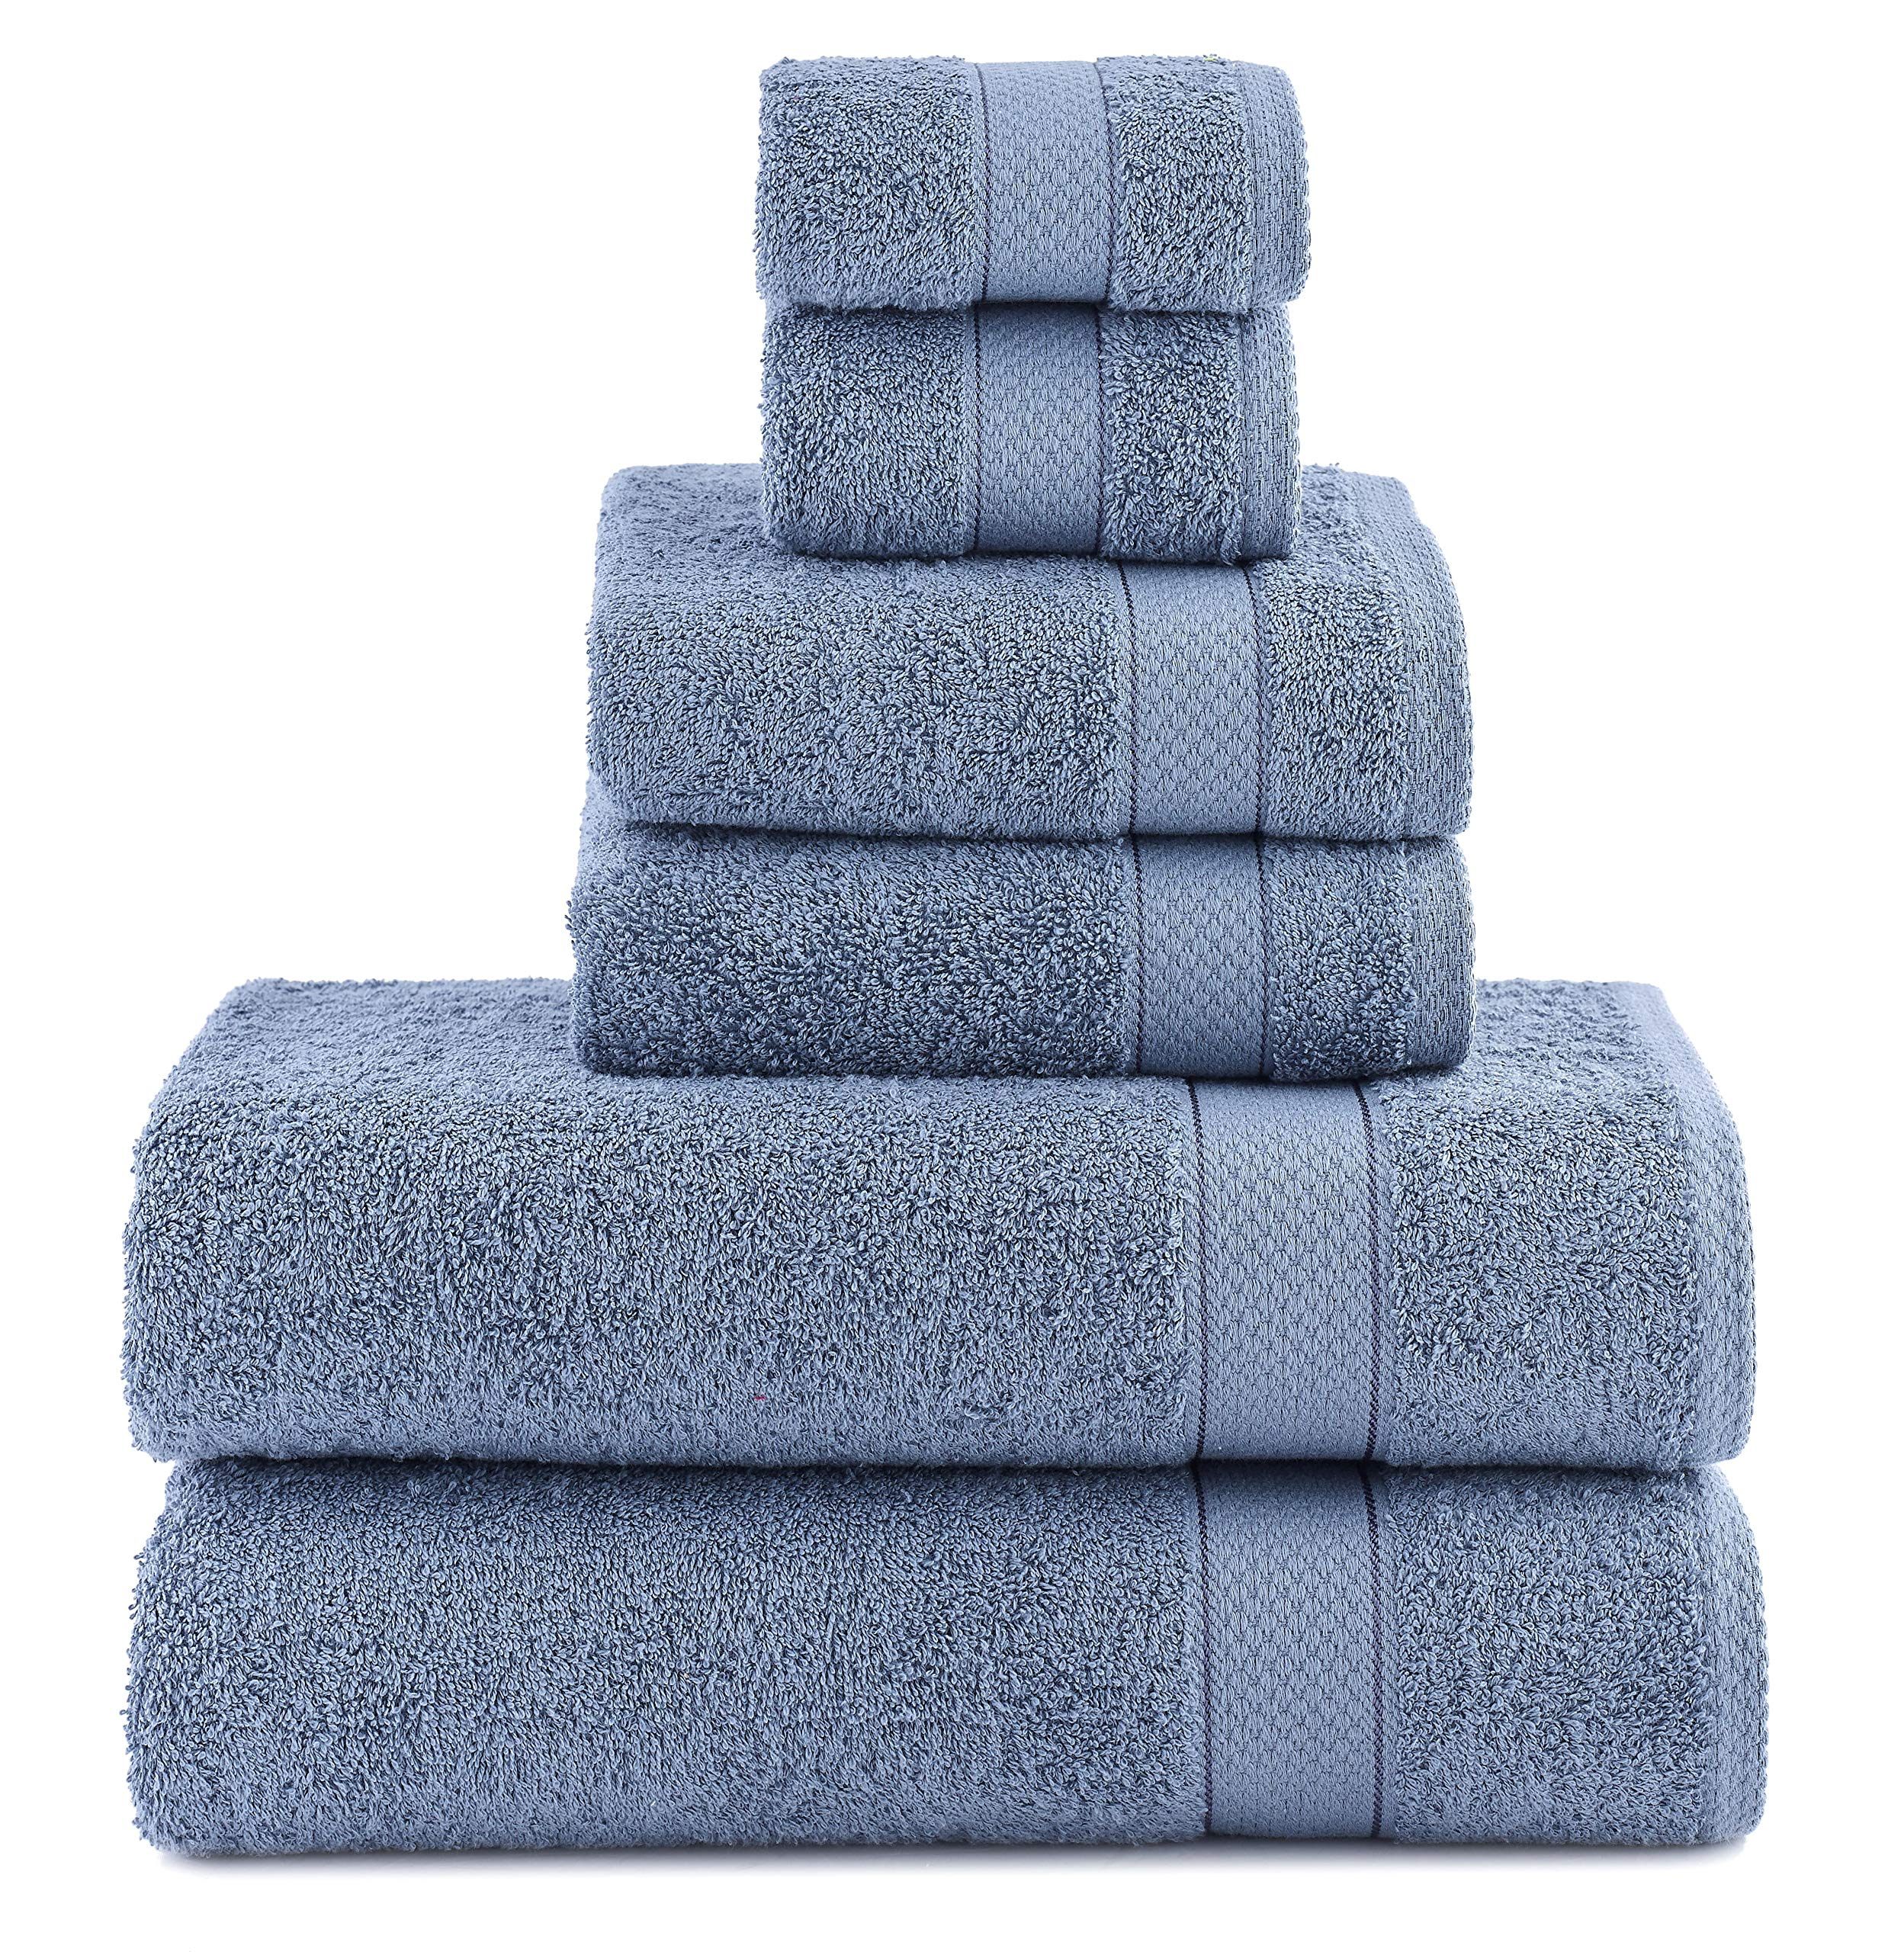 ixirhome Turkish Towel Set 6 Piece,100% Cotton, 2 Bath Towels, 2 Hand Towels 2 Washcloths, Machine Washable, Hotel Quality, Super Soft Highly Absorbent (MARINE BLUE)